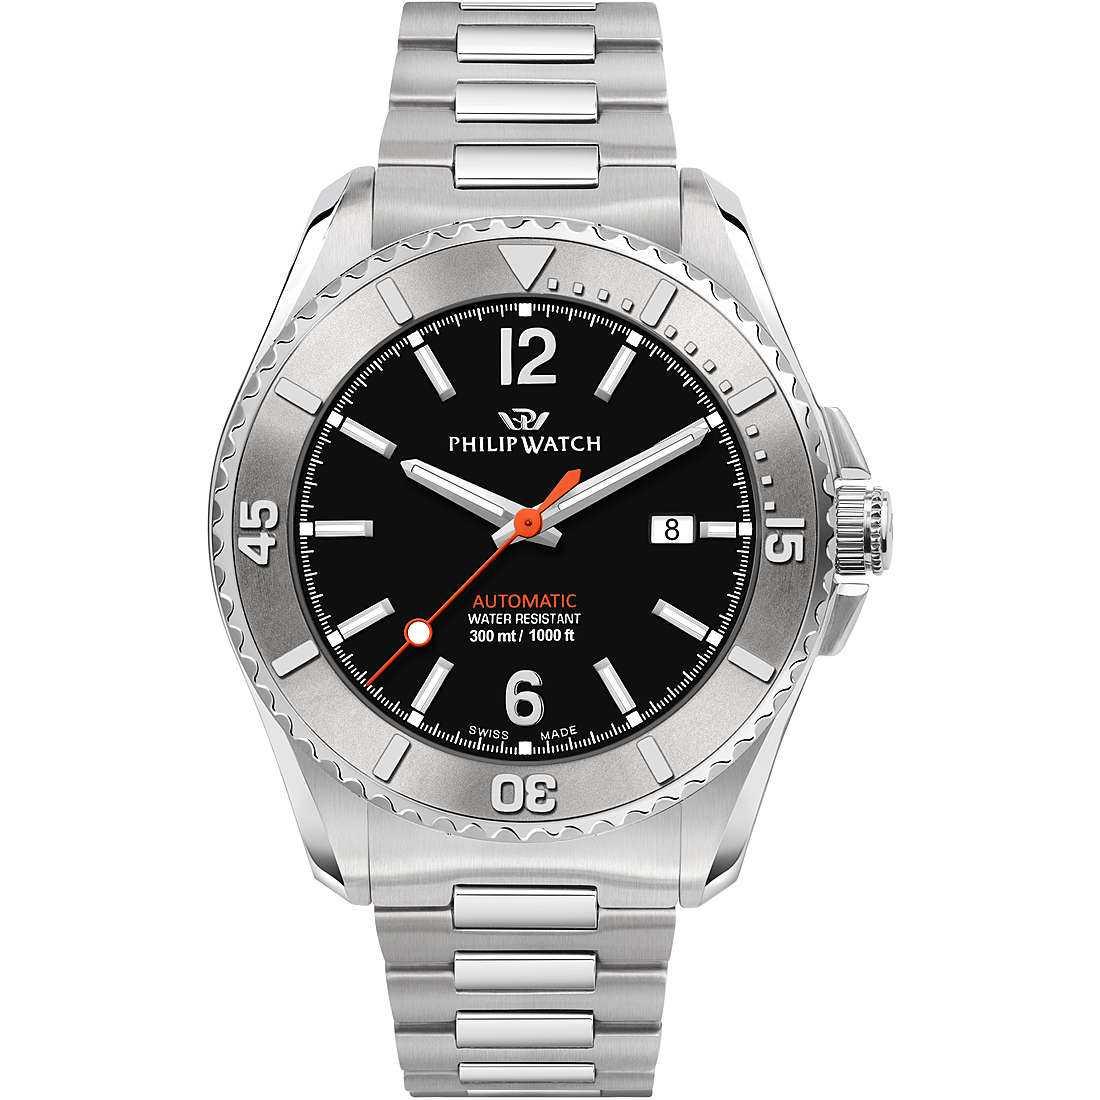 Orologio meccanico uomo philip watch r8223218003